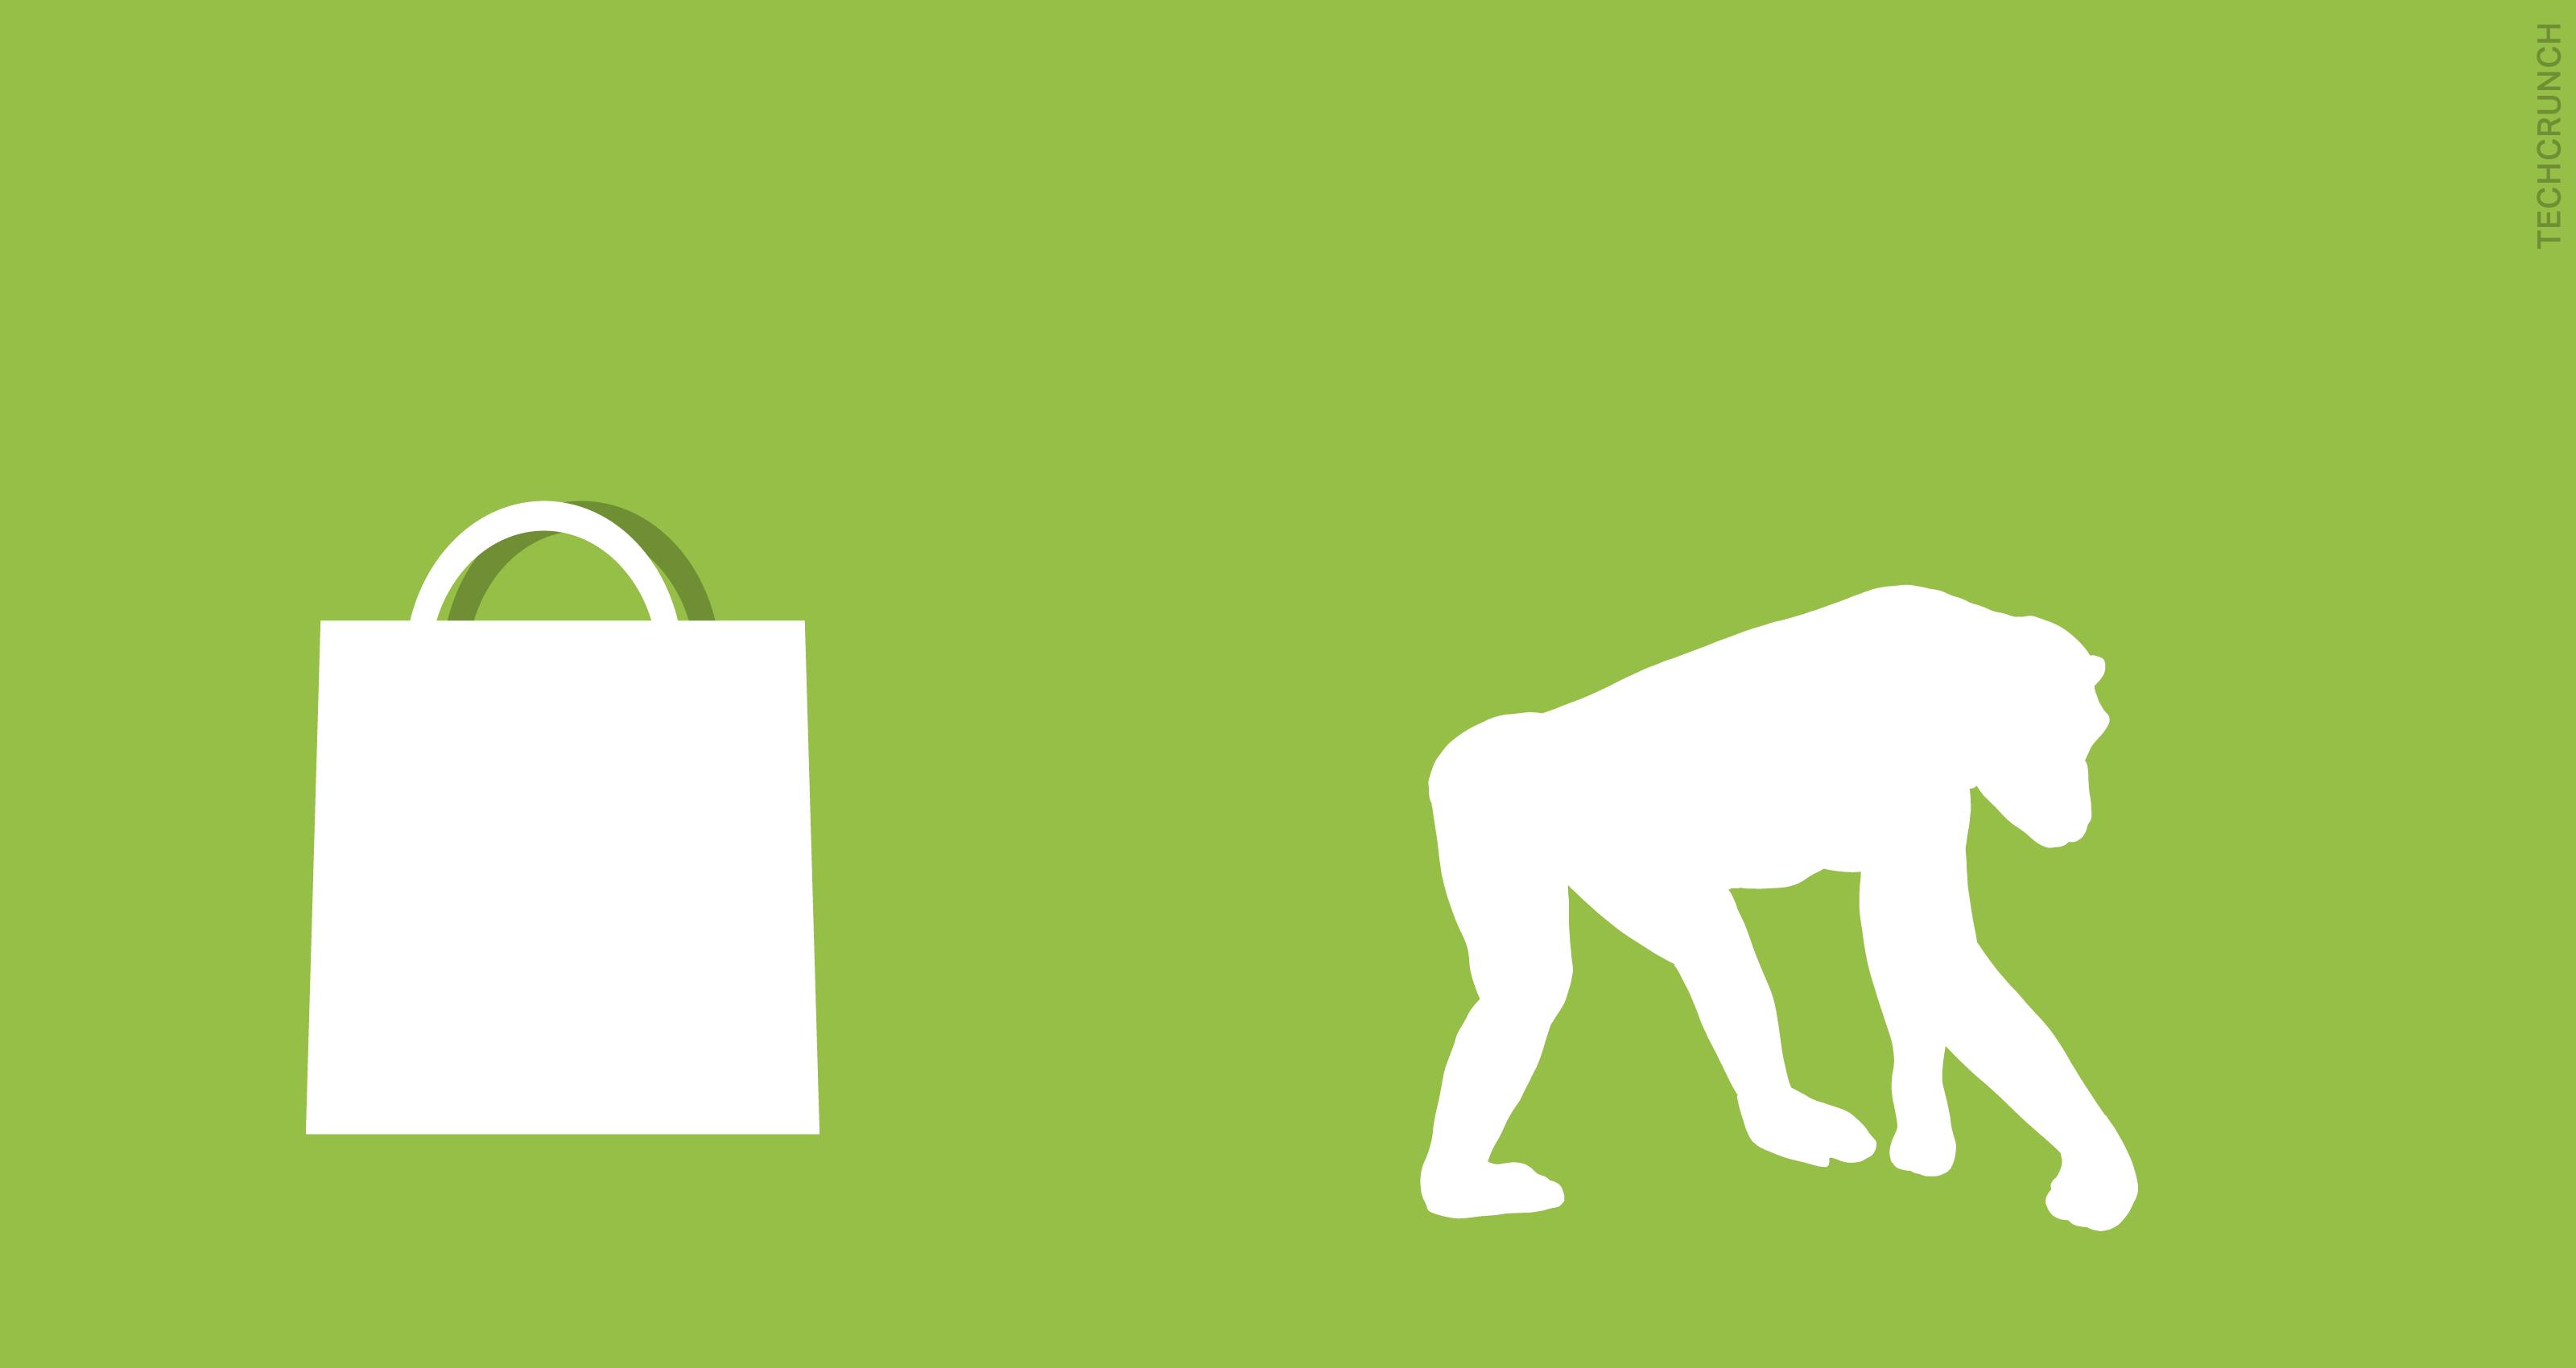 Mailchimp and Shopify break up | TechCrunch